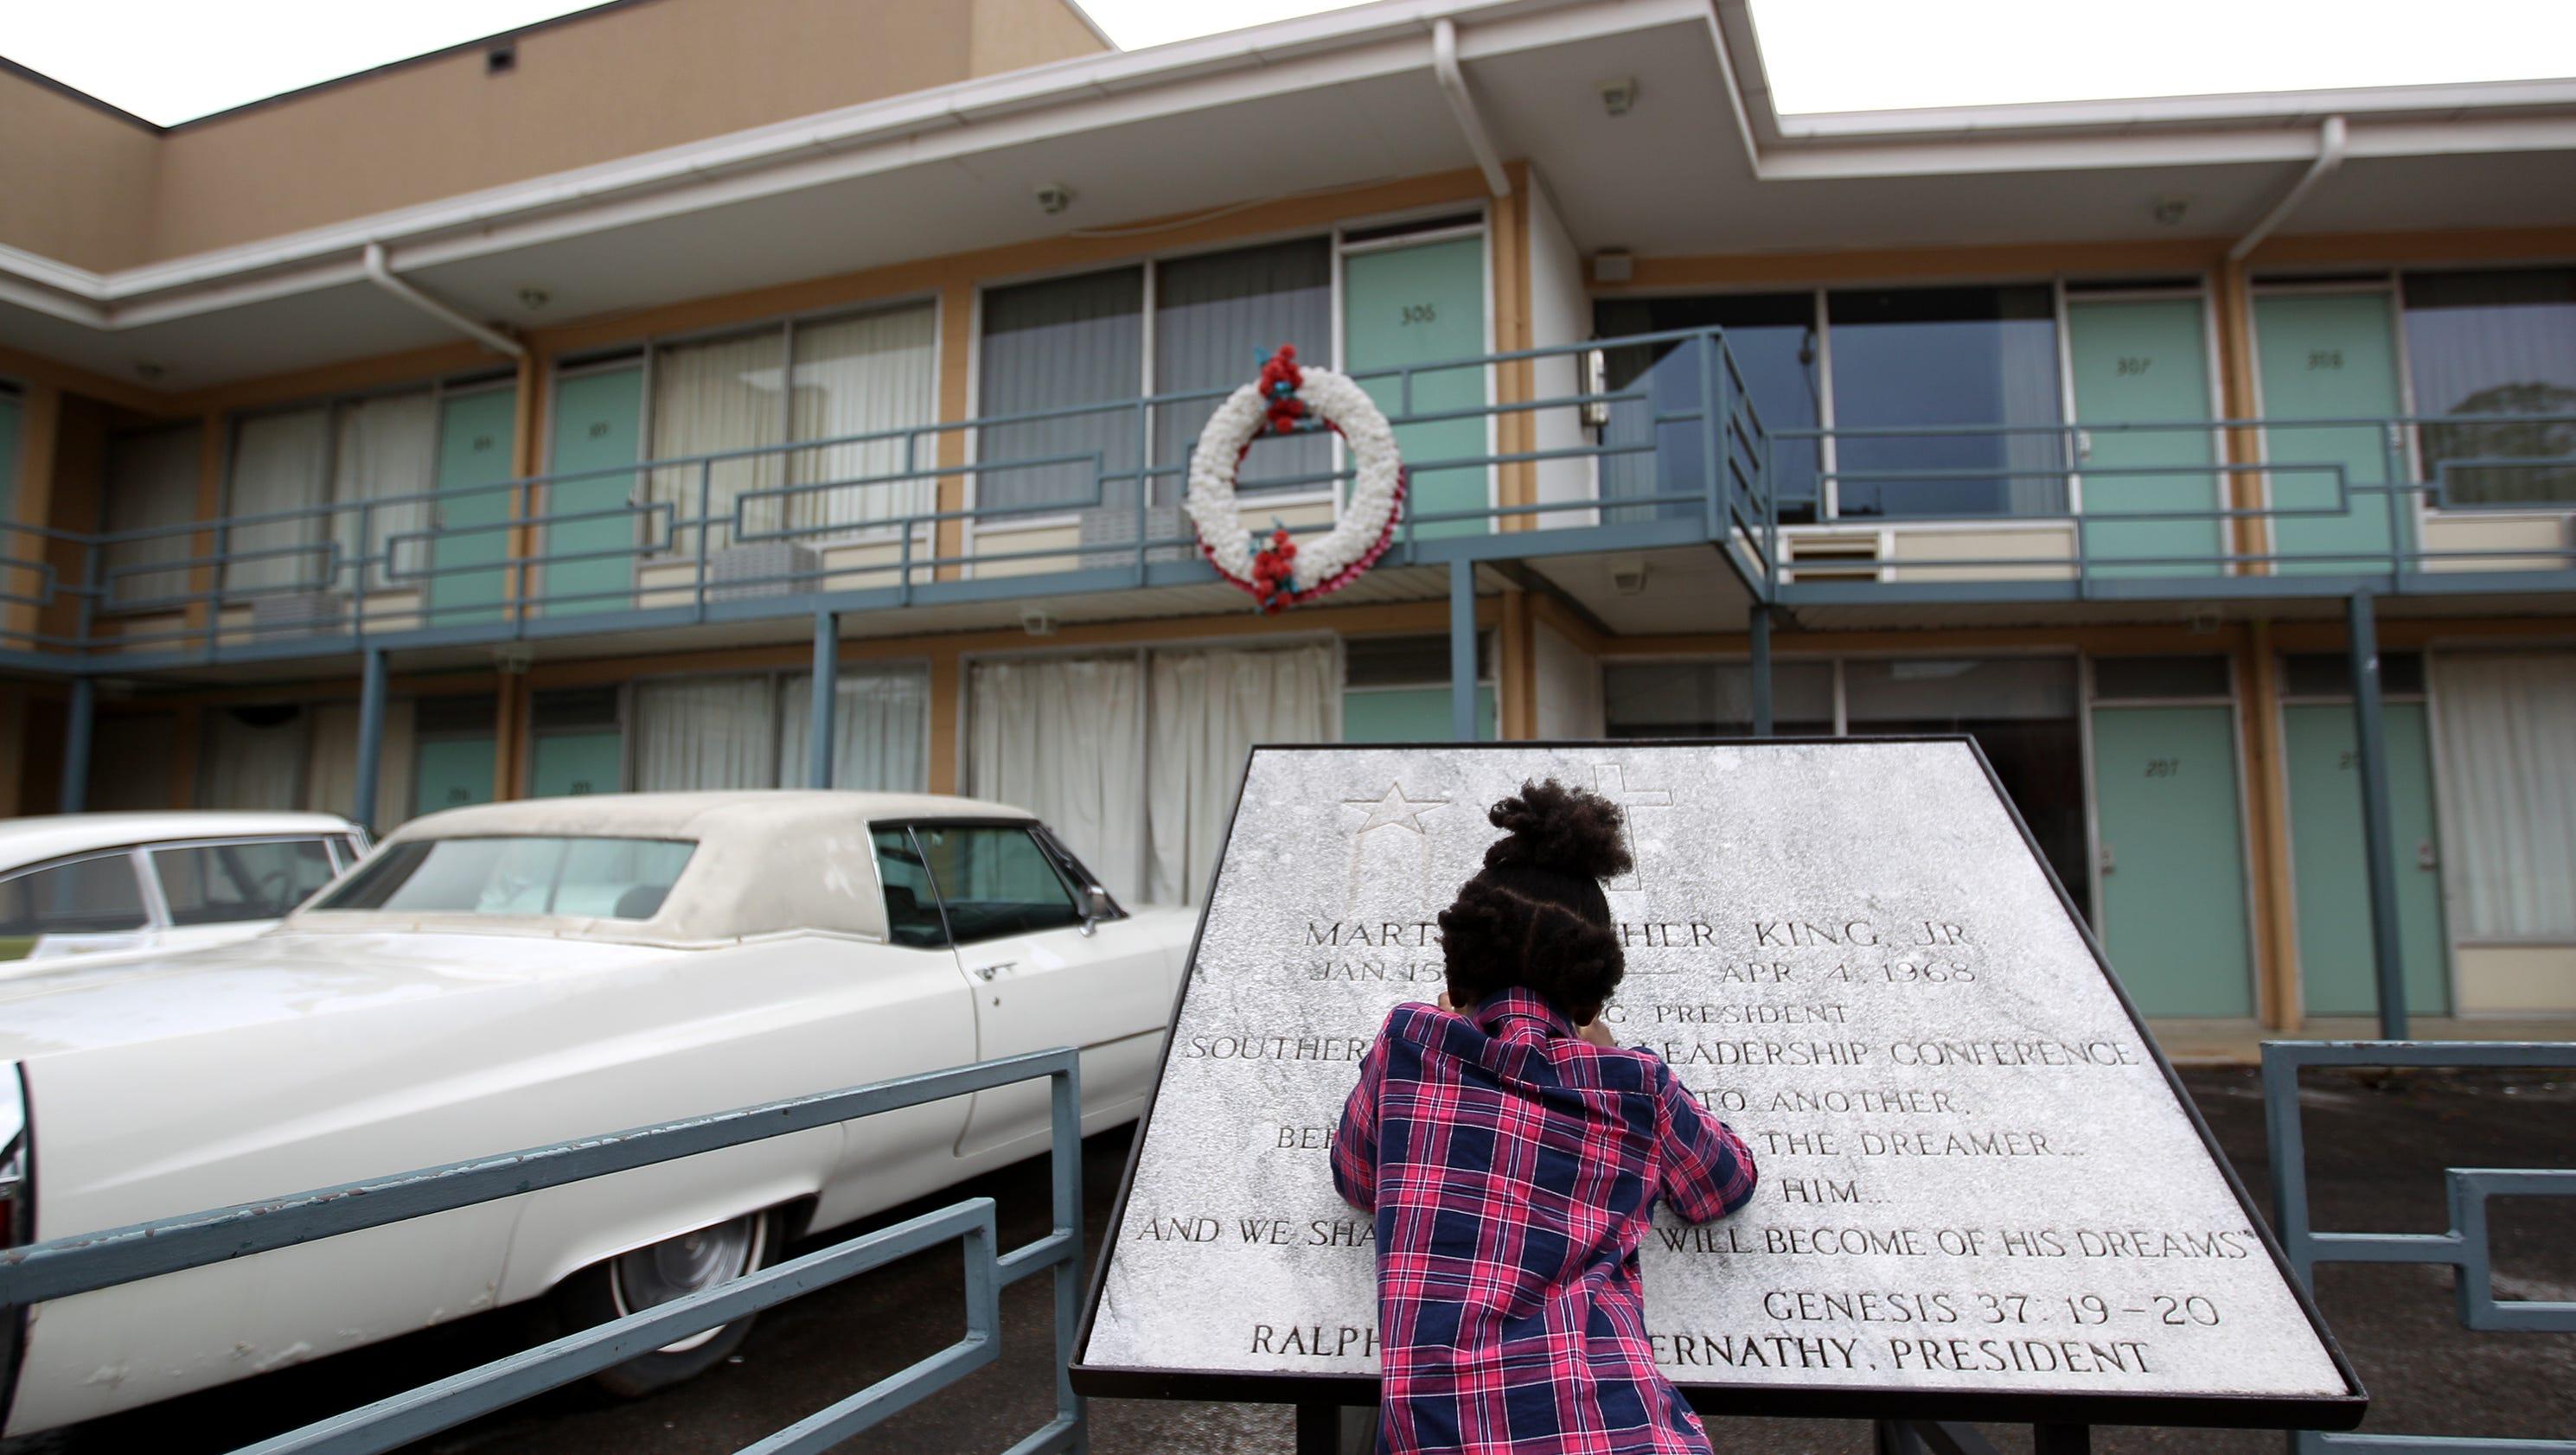 Civil Rights Museum announces MLK50 memoration